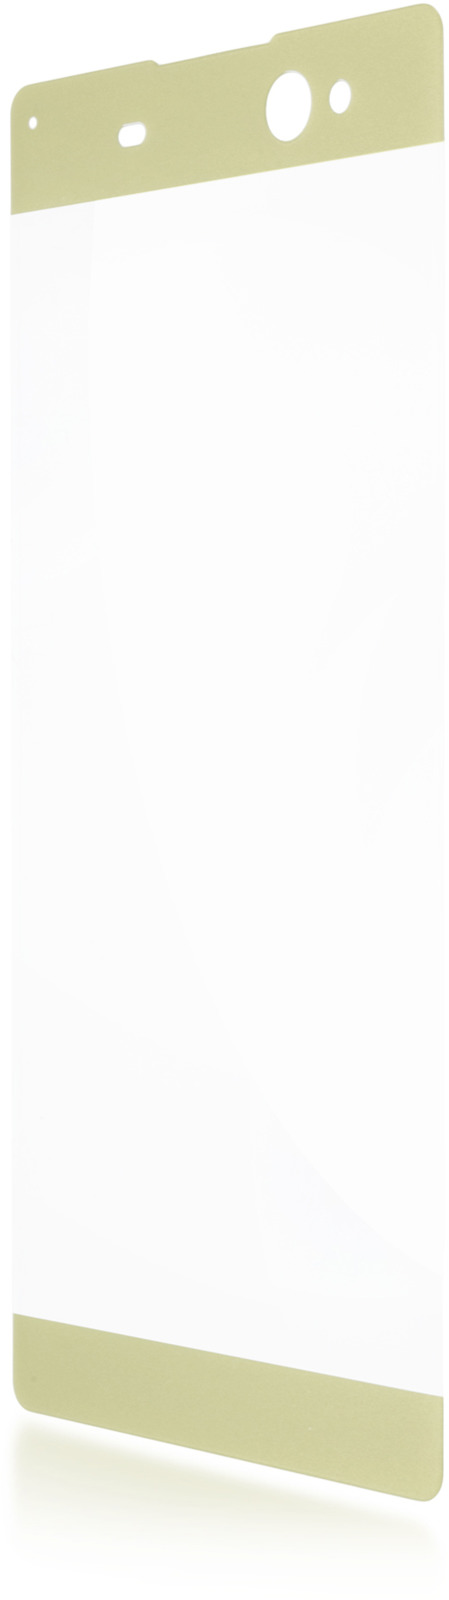 Защитное стекло Brosco 3D для Sony Xperia XA Ultra, золотой